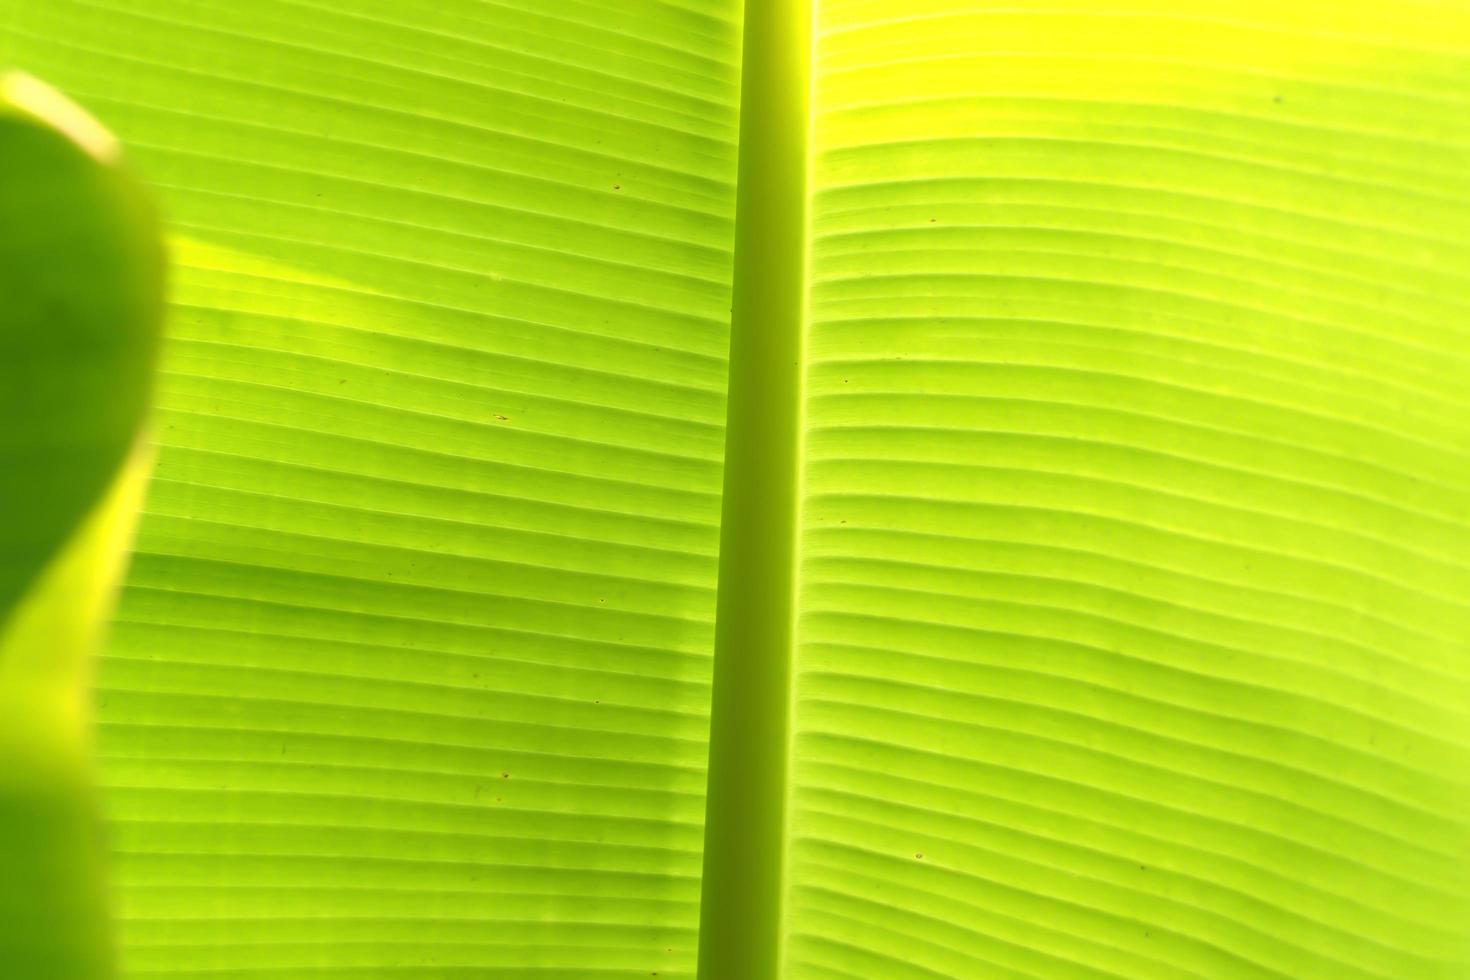 Green tropical leaf close up photo